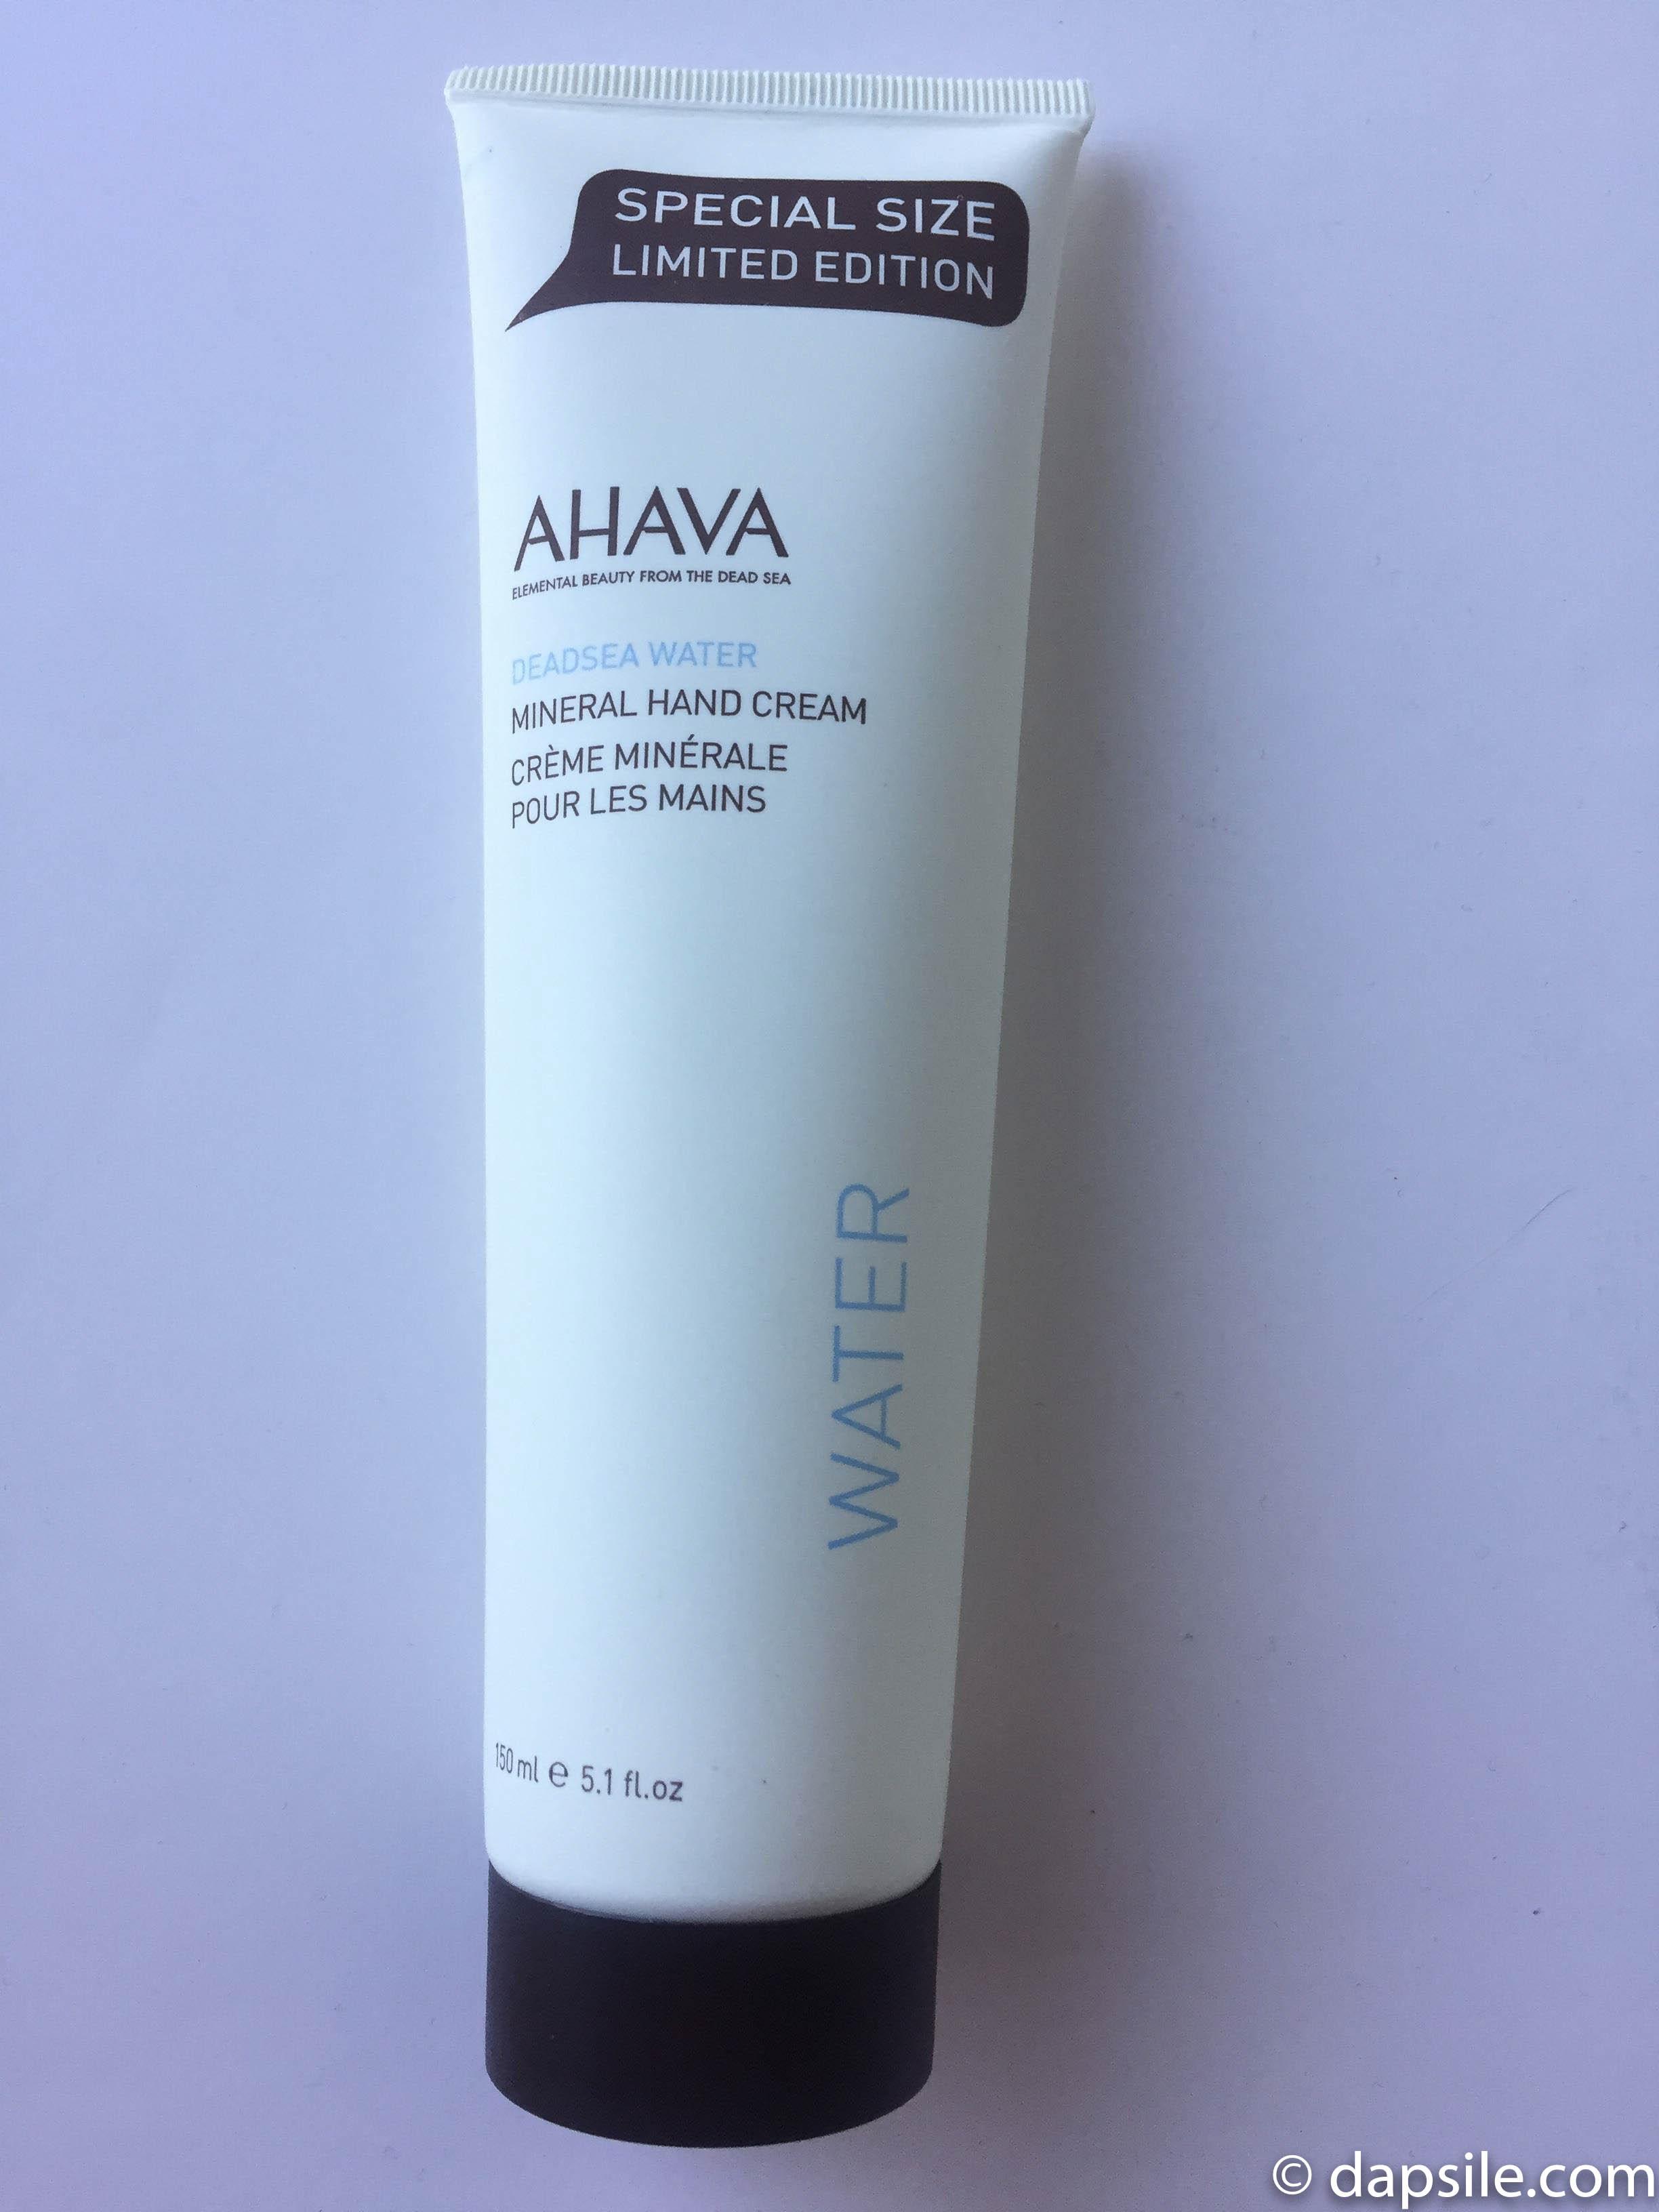 AHAVA Dead Sea Water Hand Cream from the FabFitFun Winter 2017 subscription box